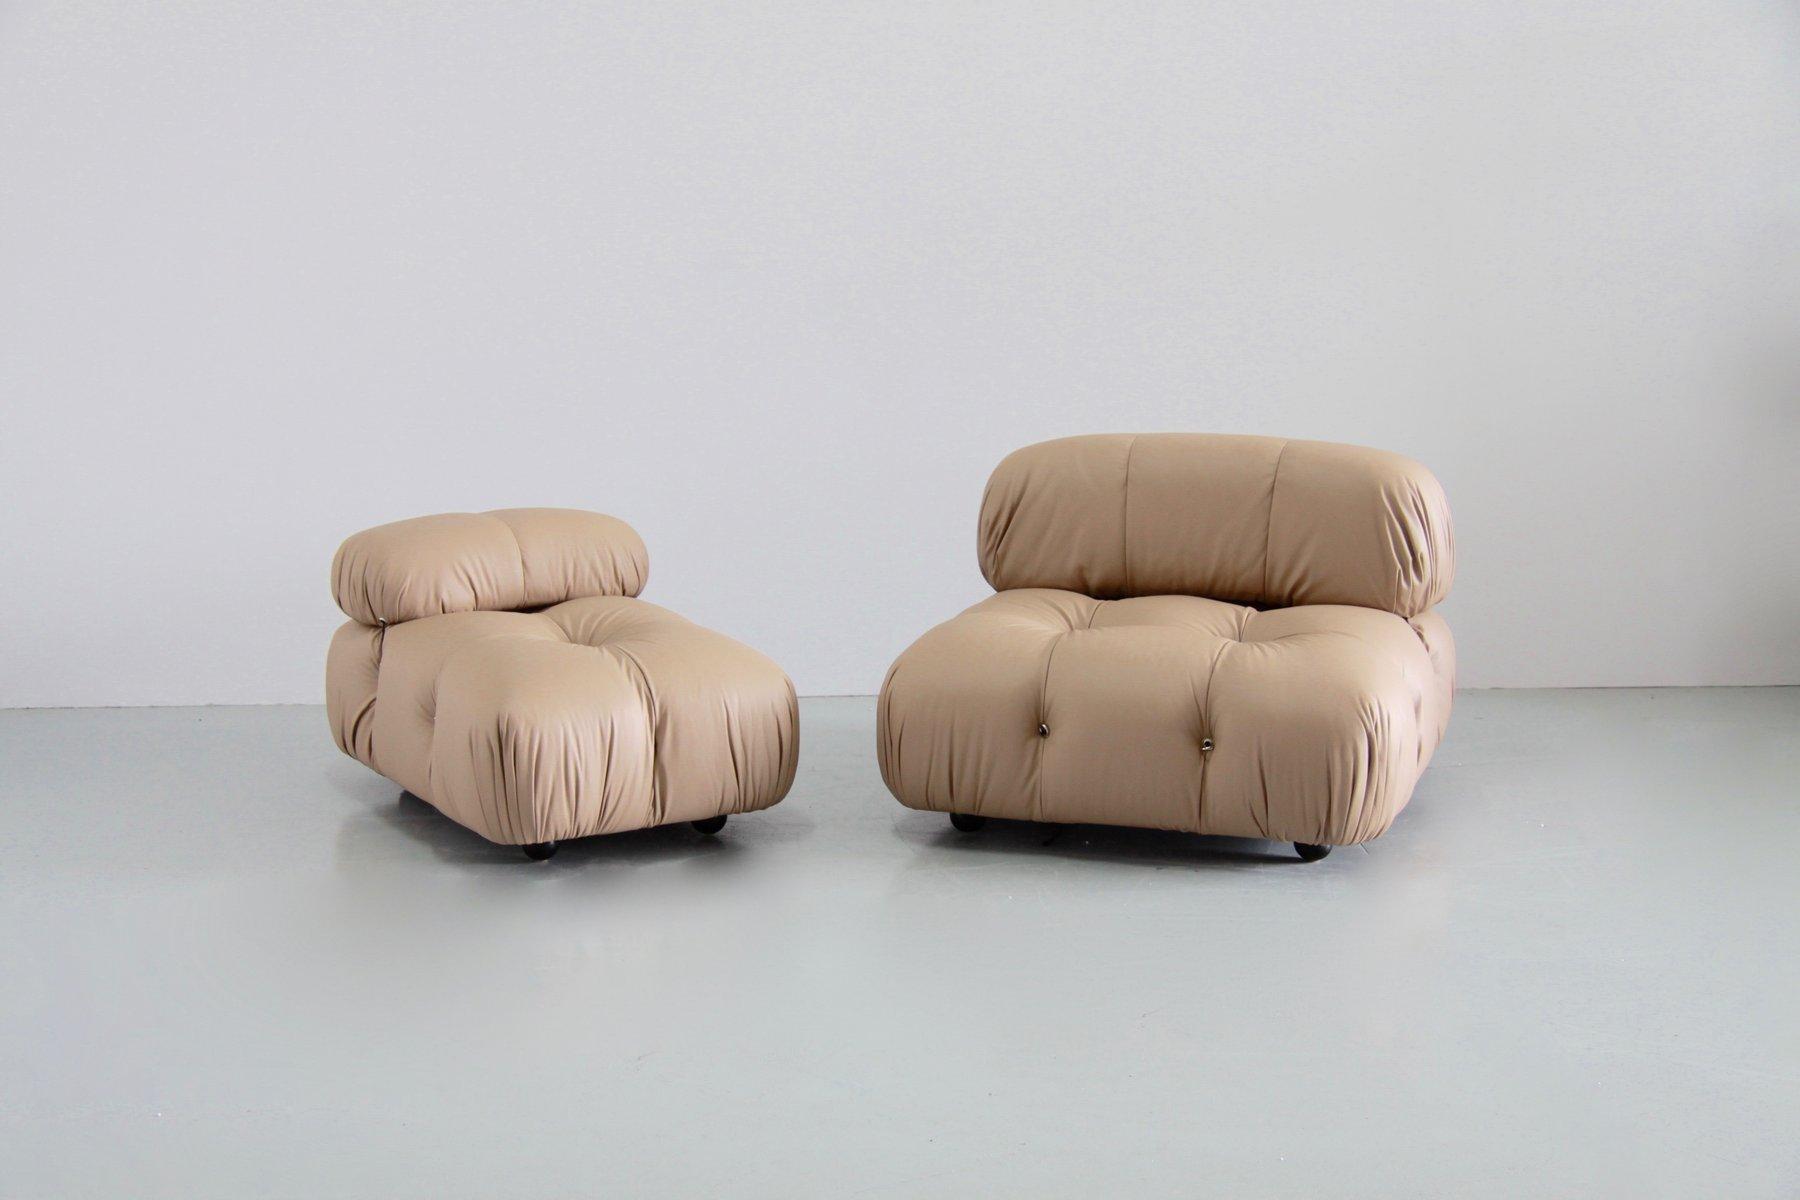 Vintage Camaleonda Modular Lounge Sofa By Mario Bellini For B Italia 1970s